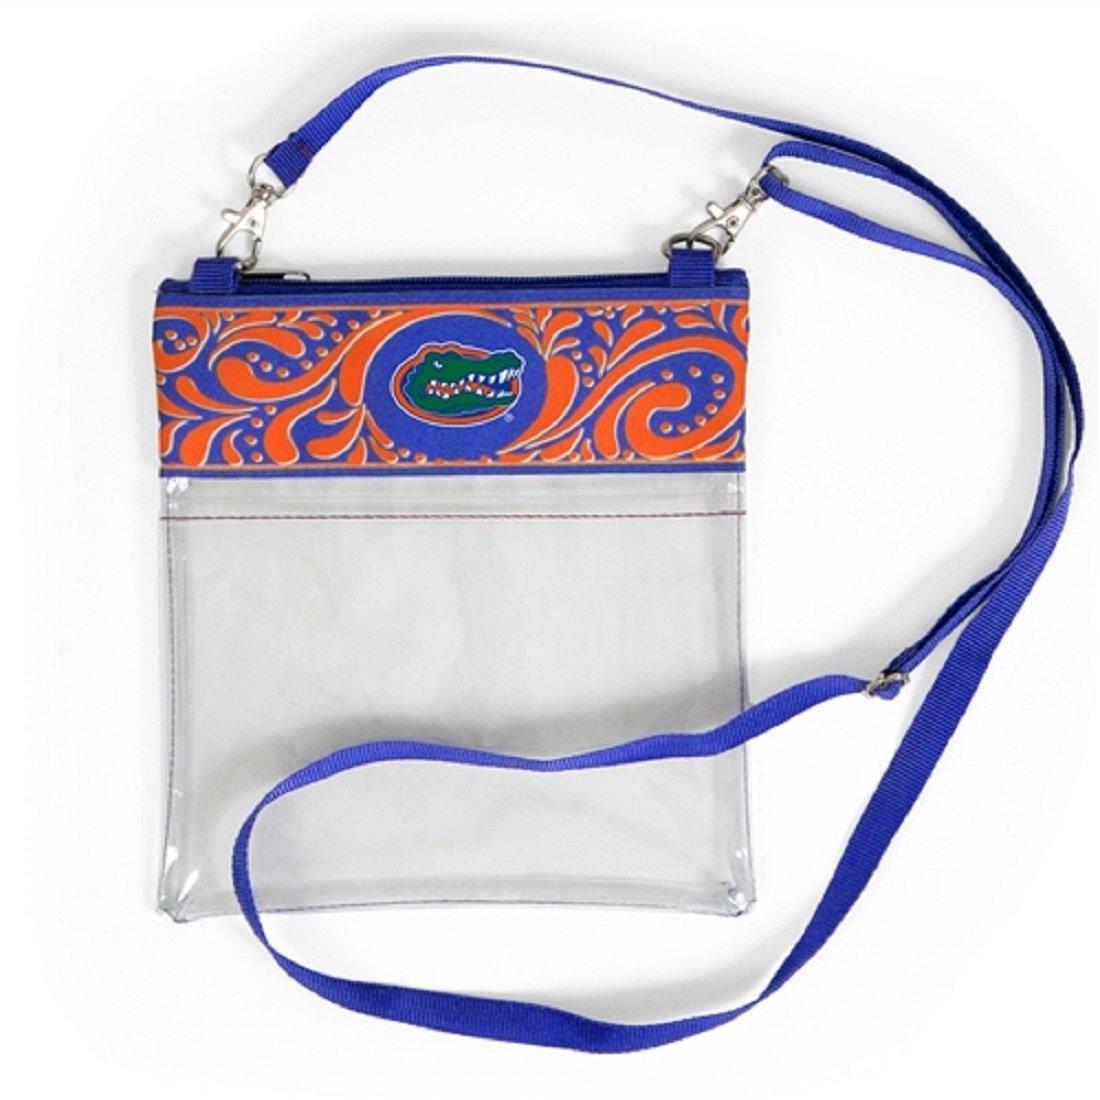 Desden Florida Gator Clear Gameday Crossbody Bag